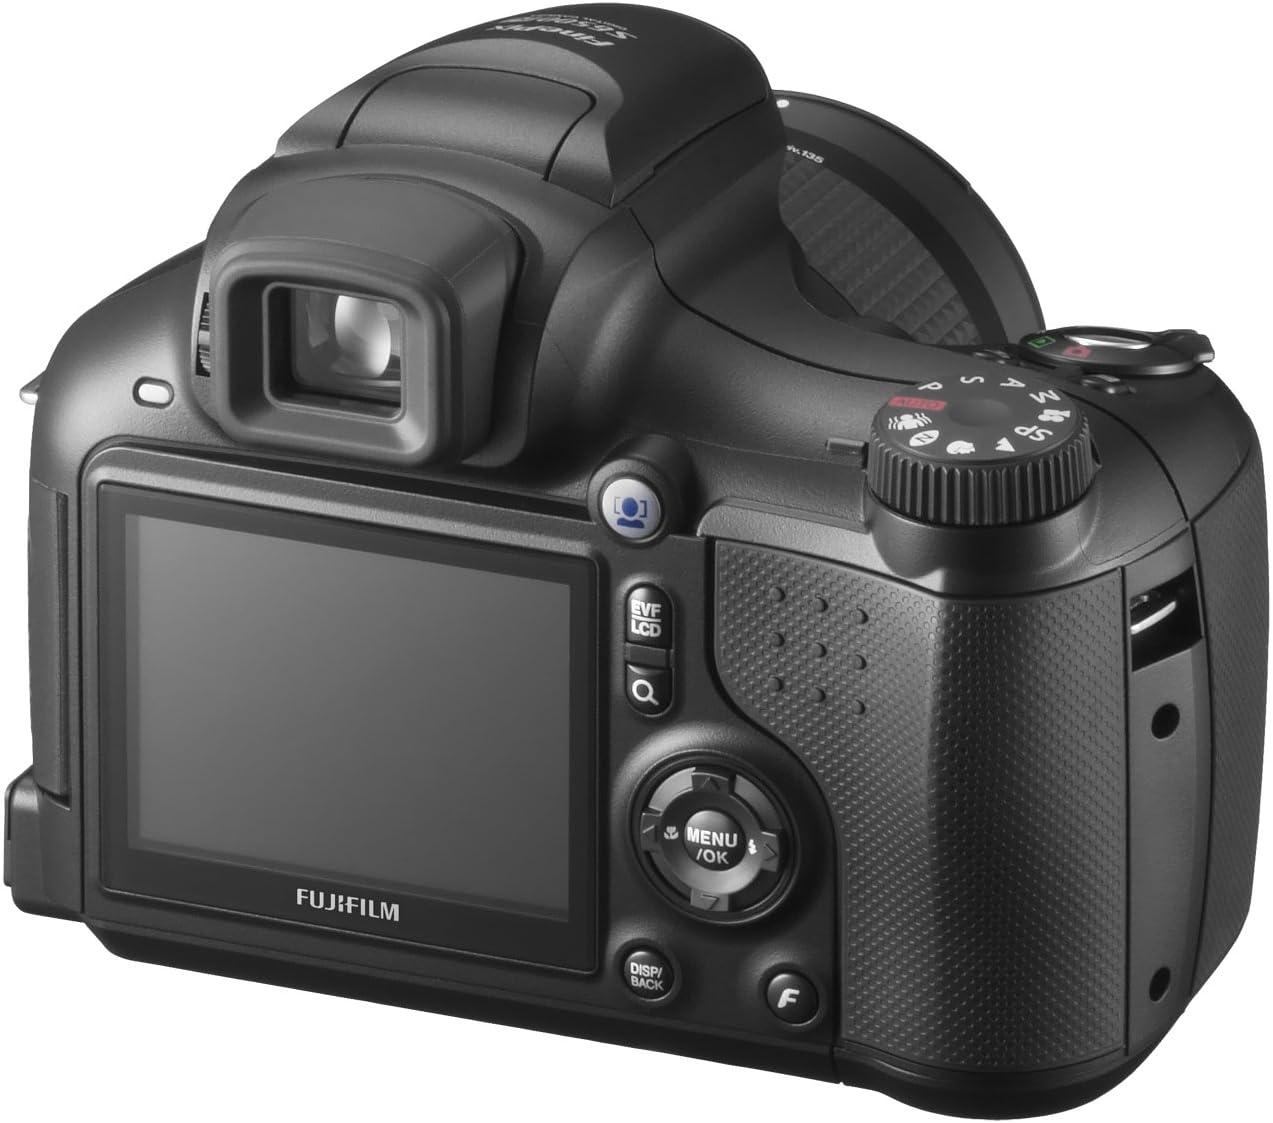 Amazon.com: Fujifilm FinePix S6000FD 6,3 MP cámara digital ...